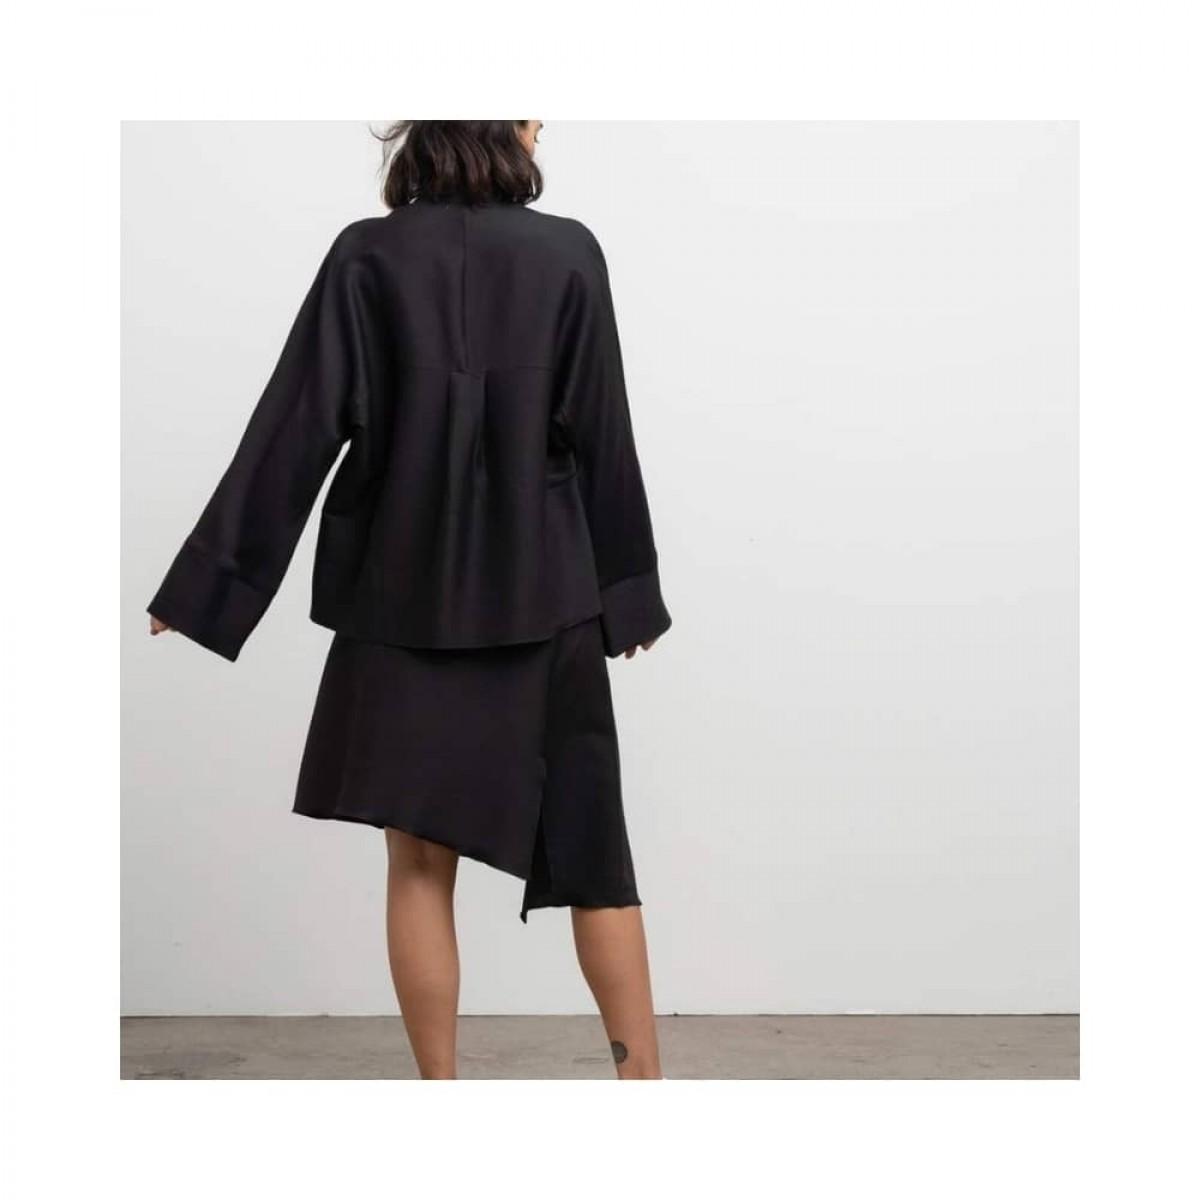 dina wool skirt - black - model ryg